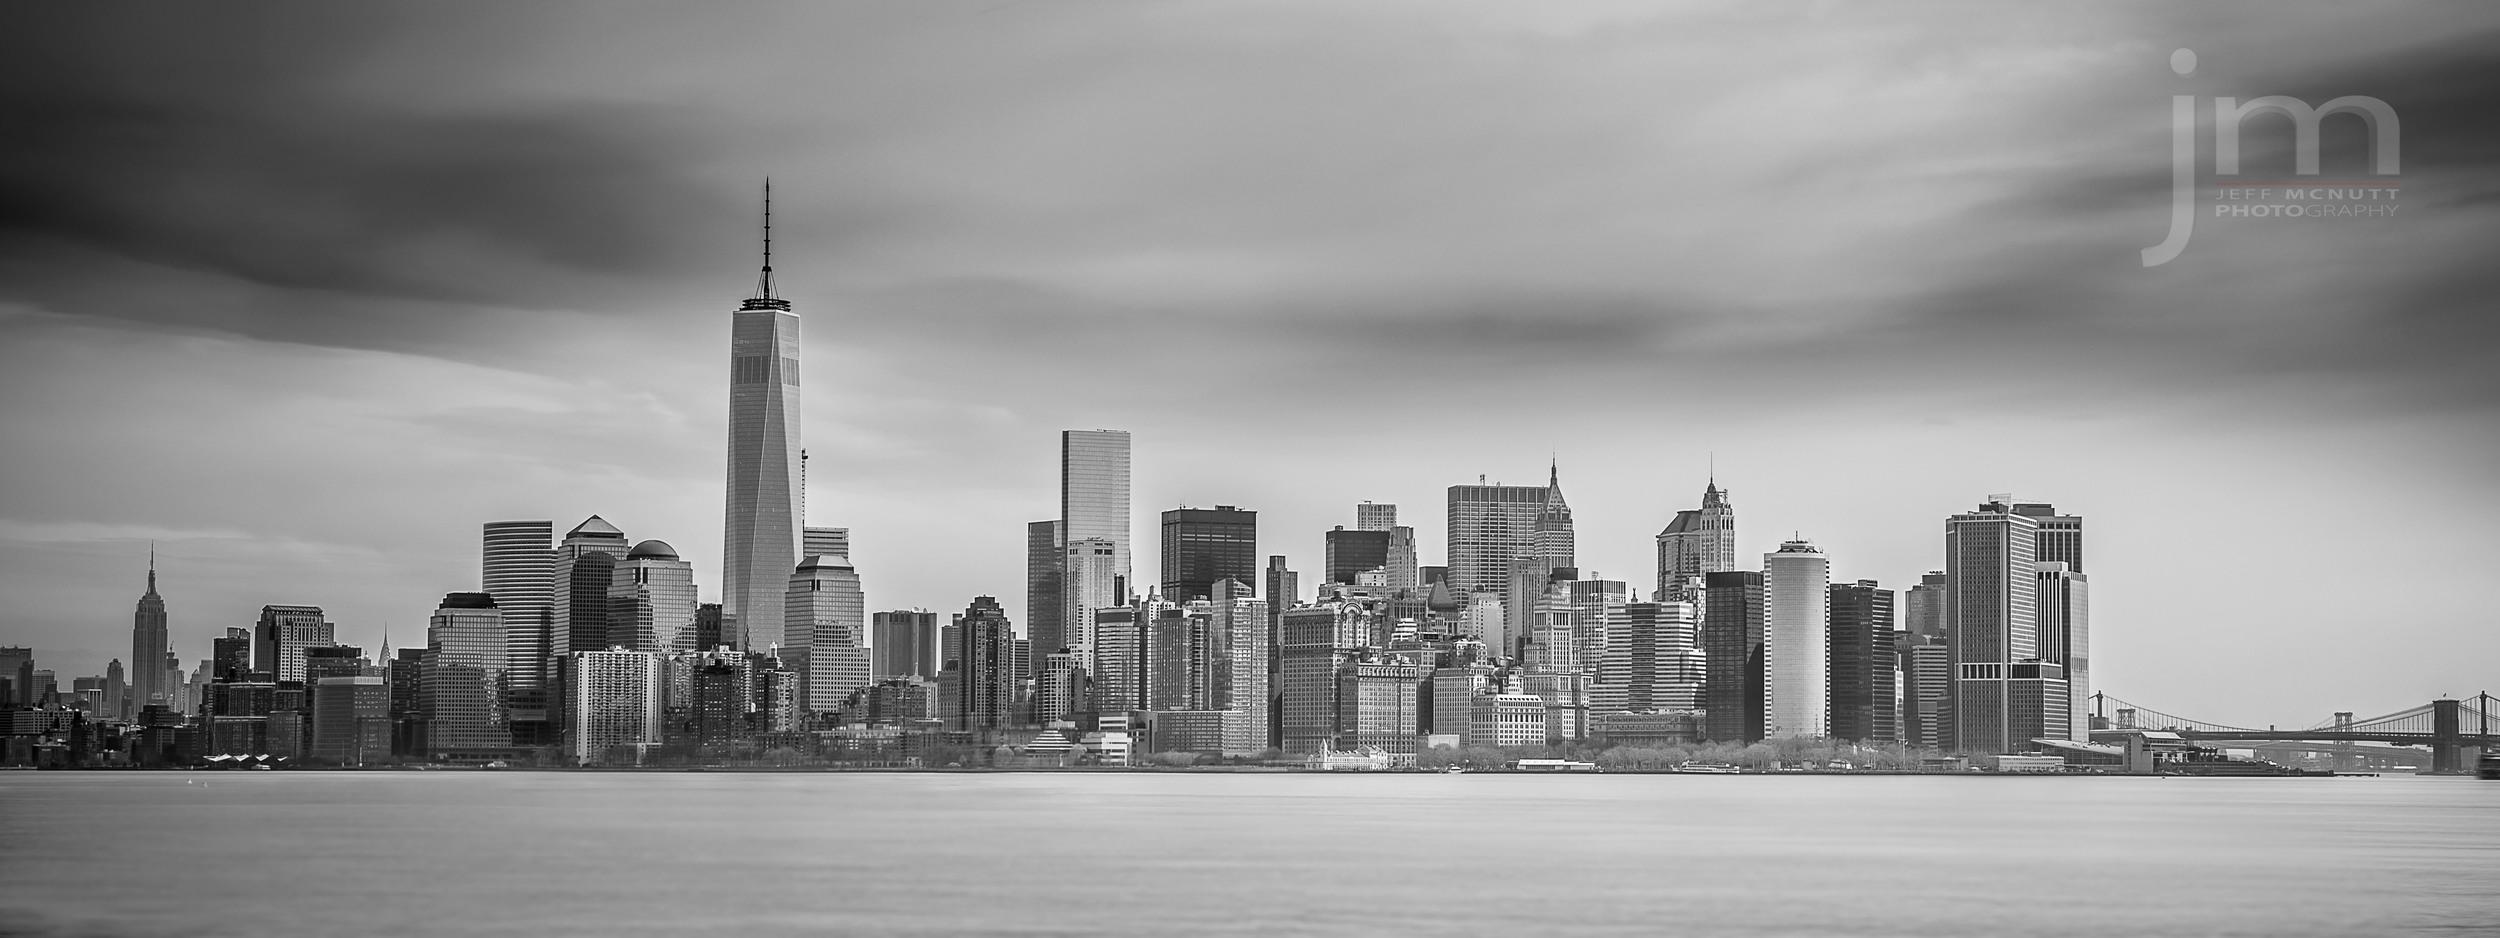 This is a shot of Manhattan taken from Ellis Island